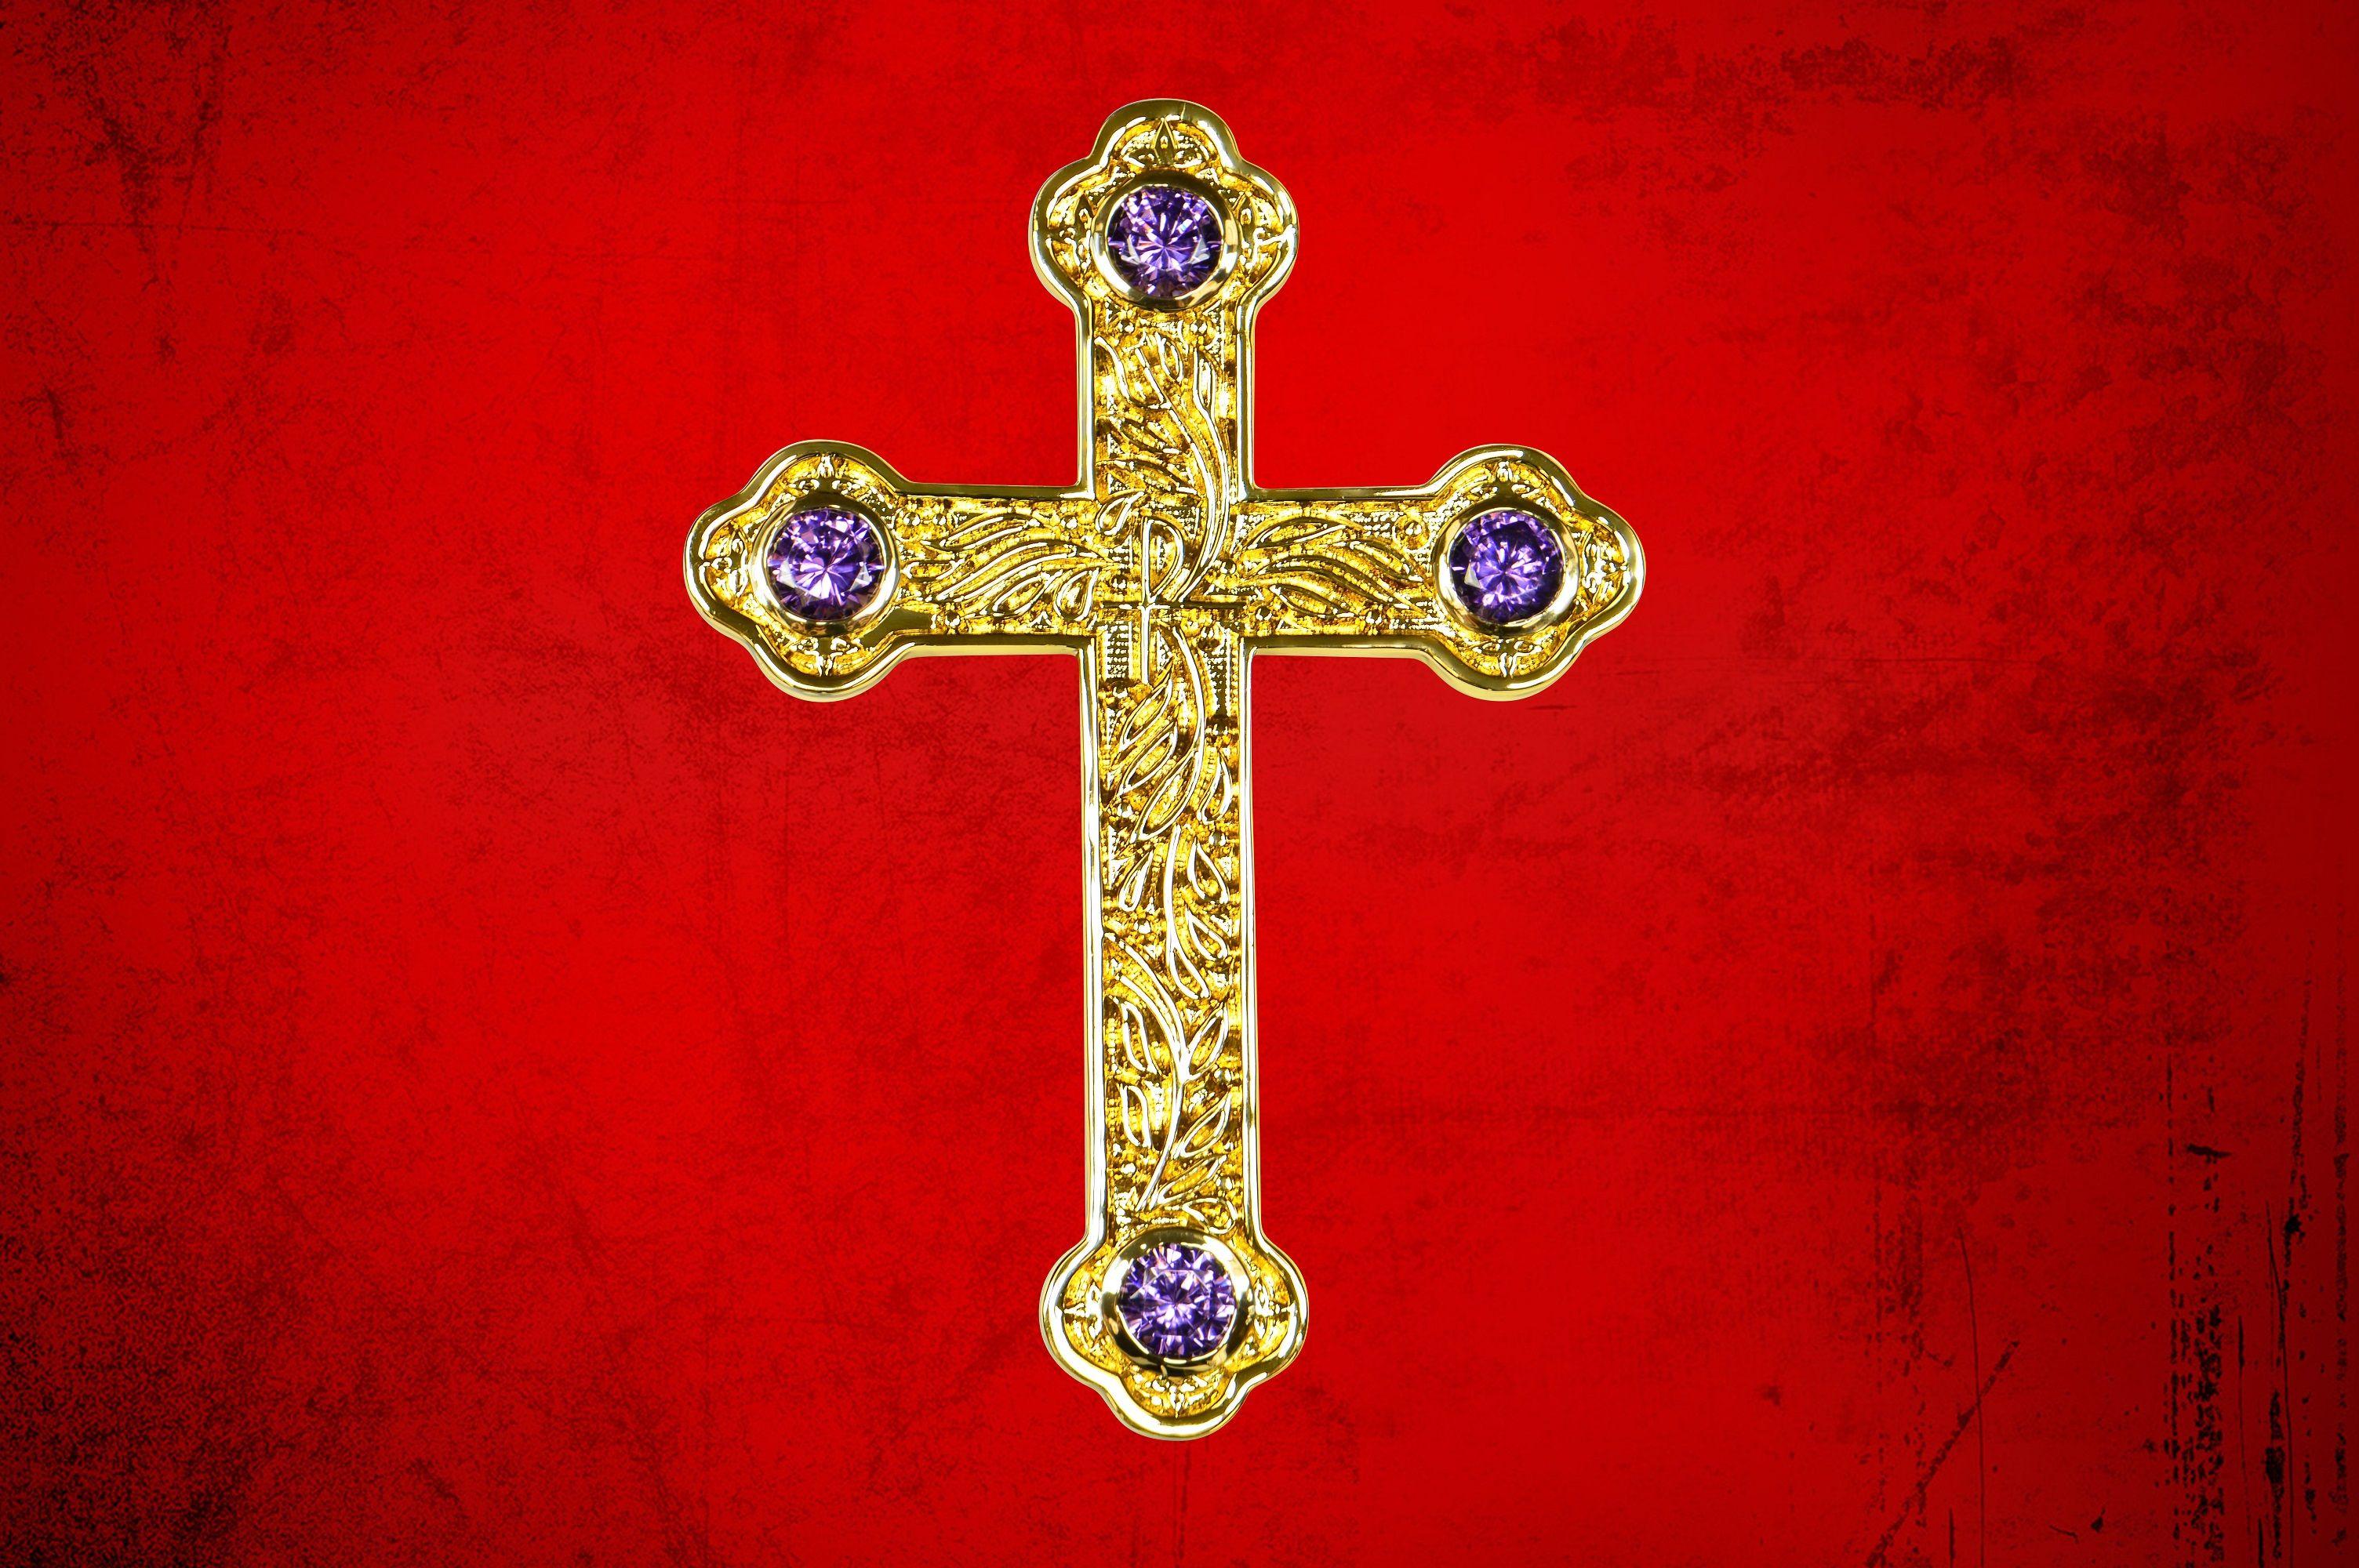 Bishop's Pectoral Cross in Gold with Purple Amethyst Stones